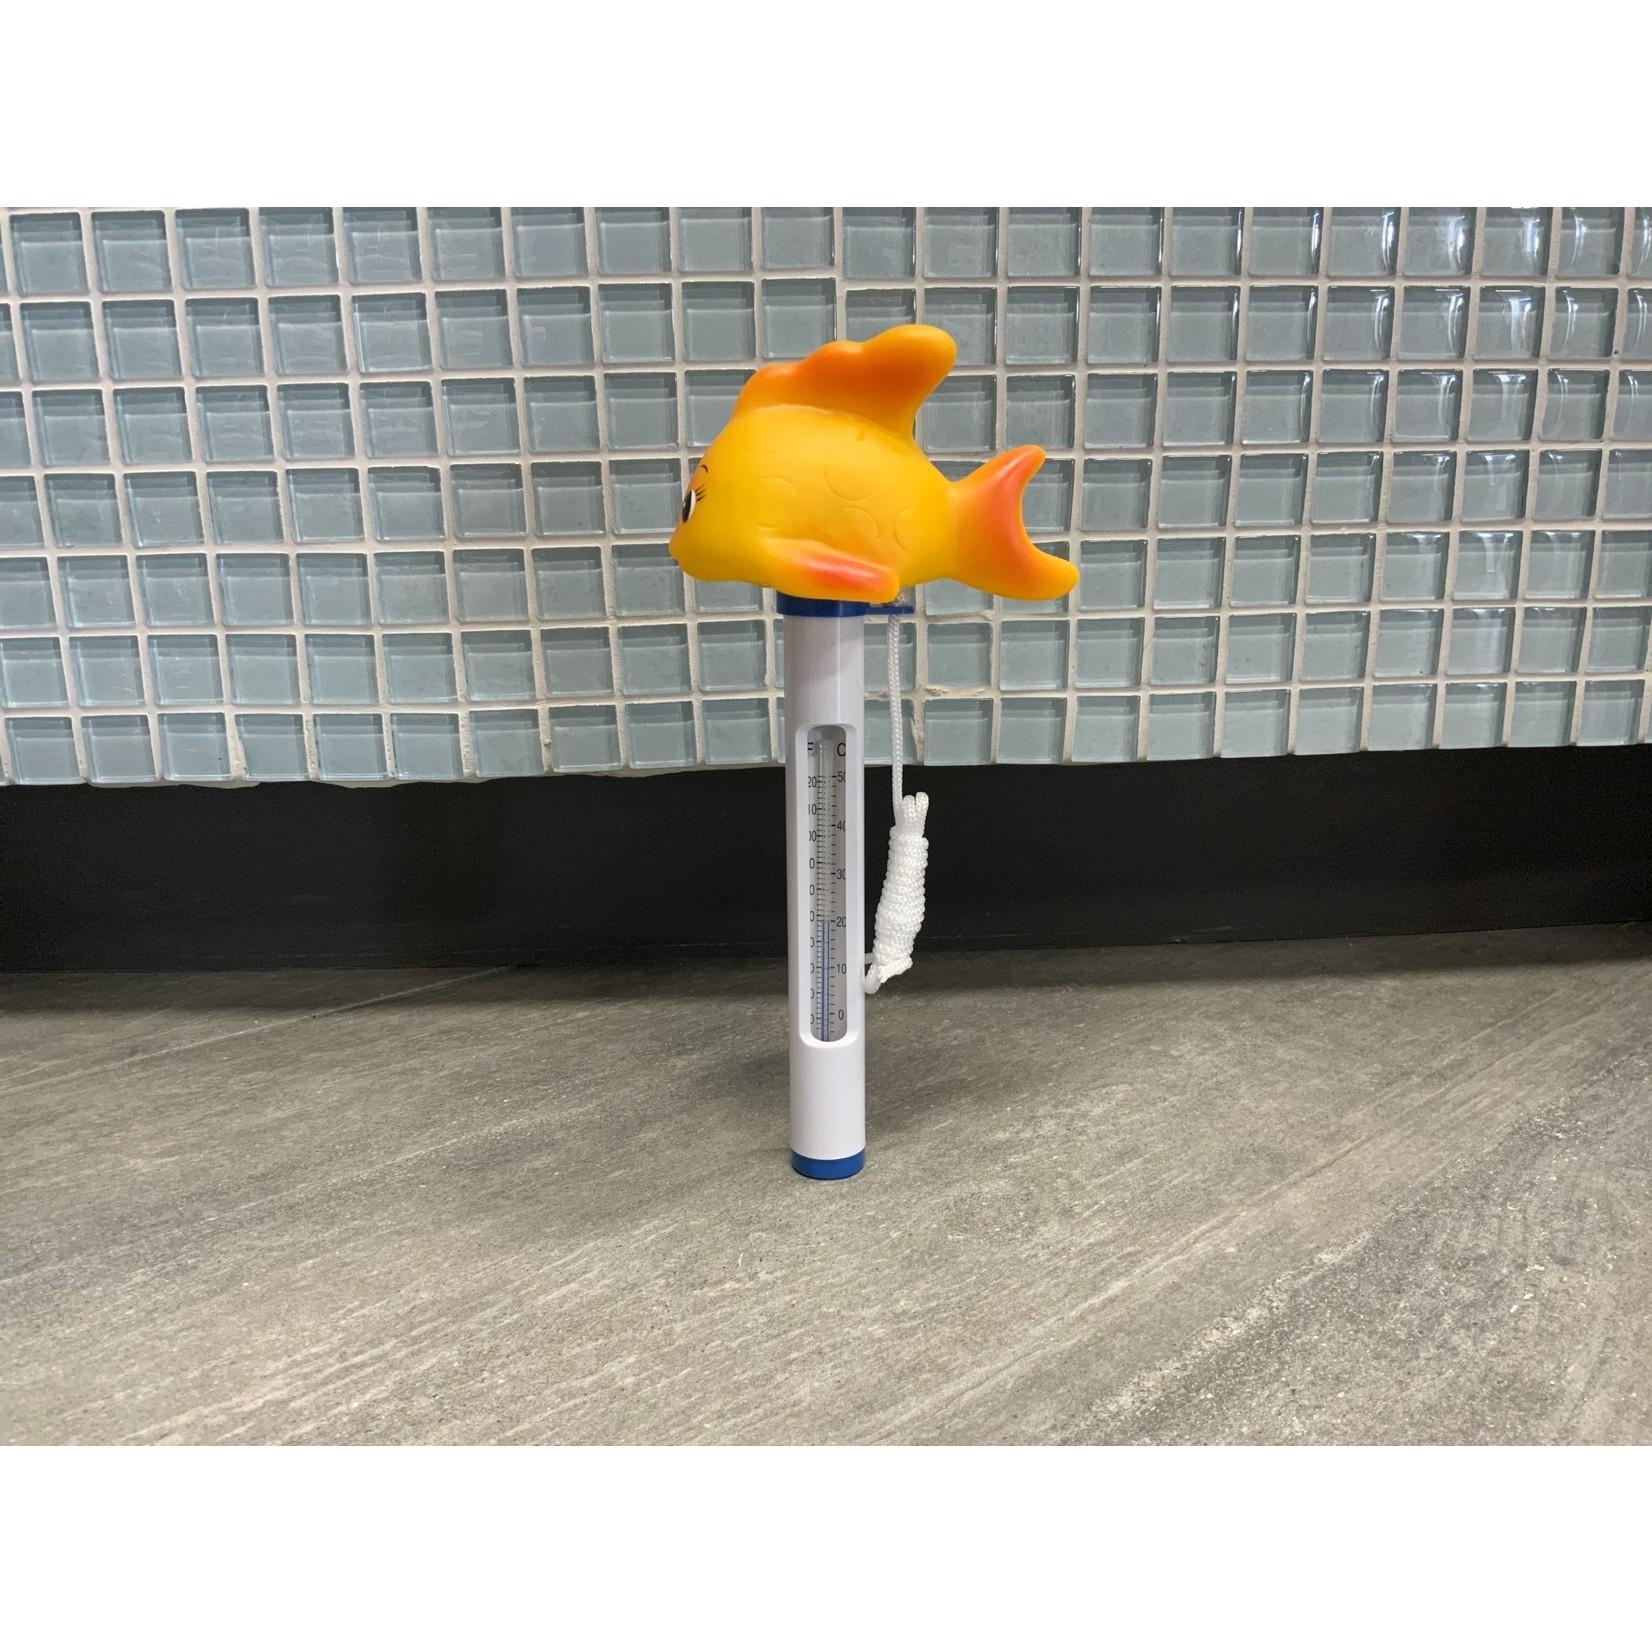 THERMOMETER YELLOW FISH